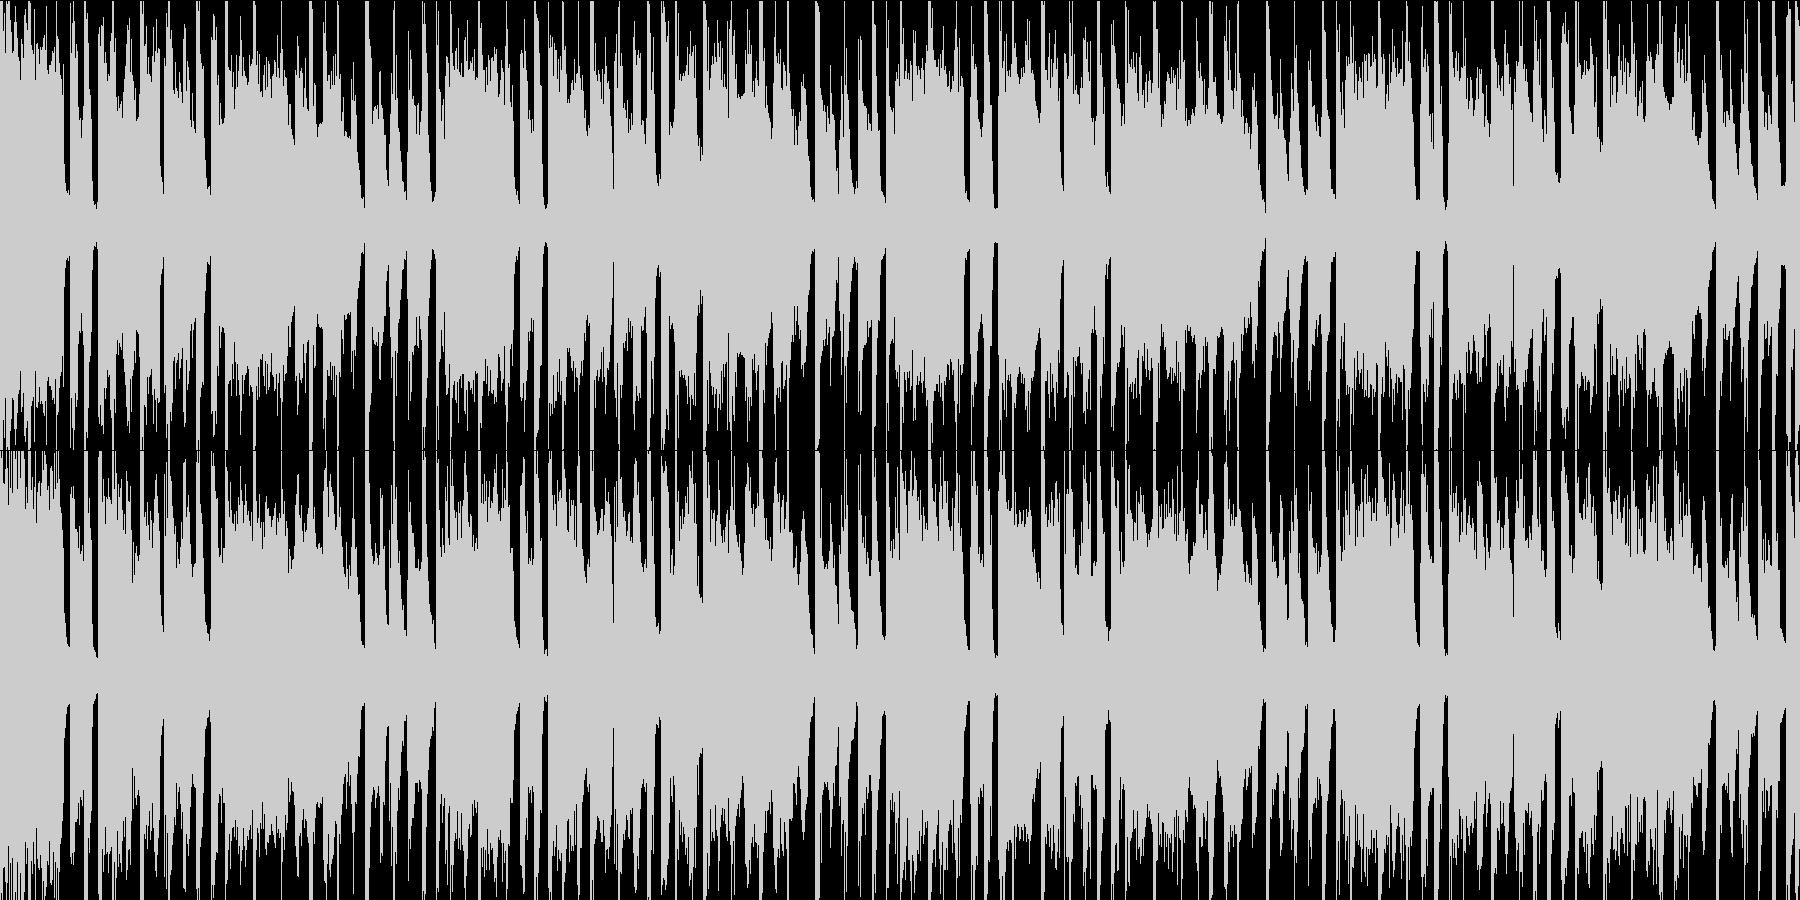 POPで軽快な四つ打ちBGMの未再生の波形